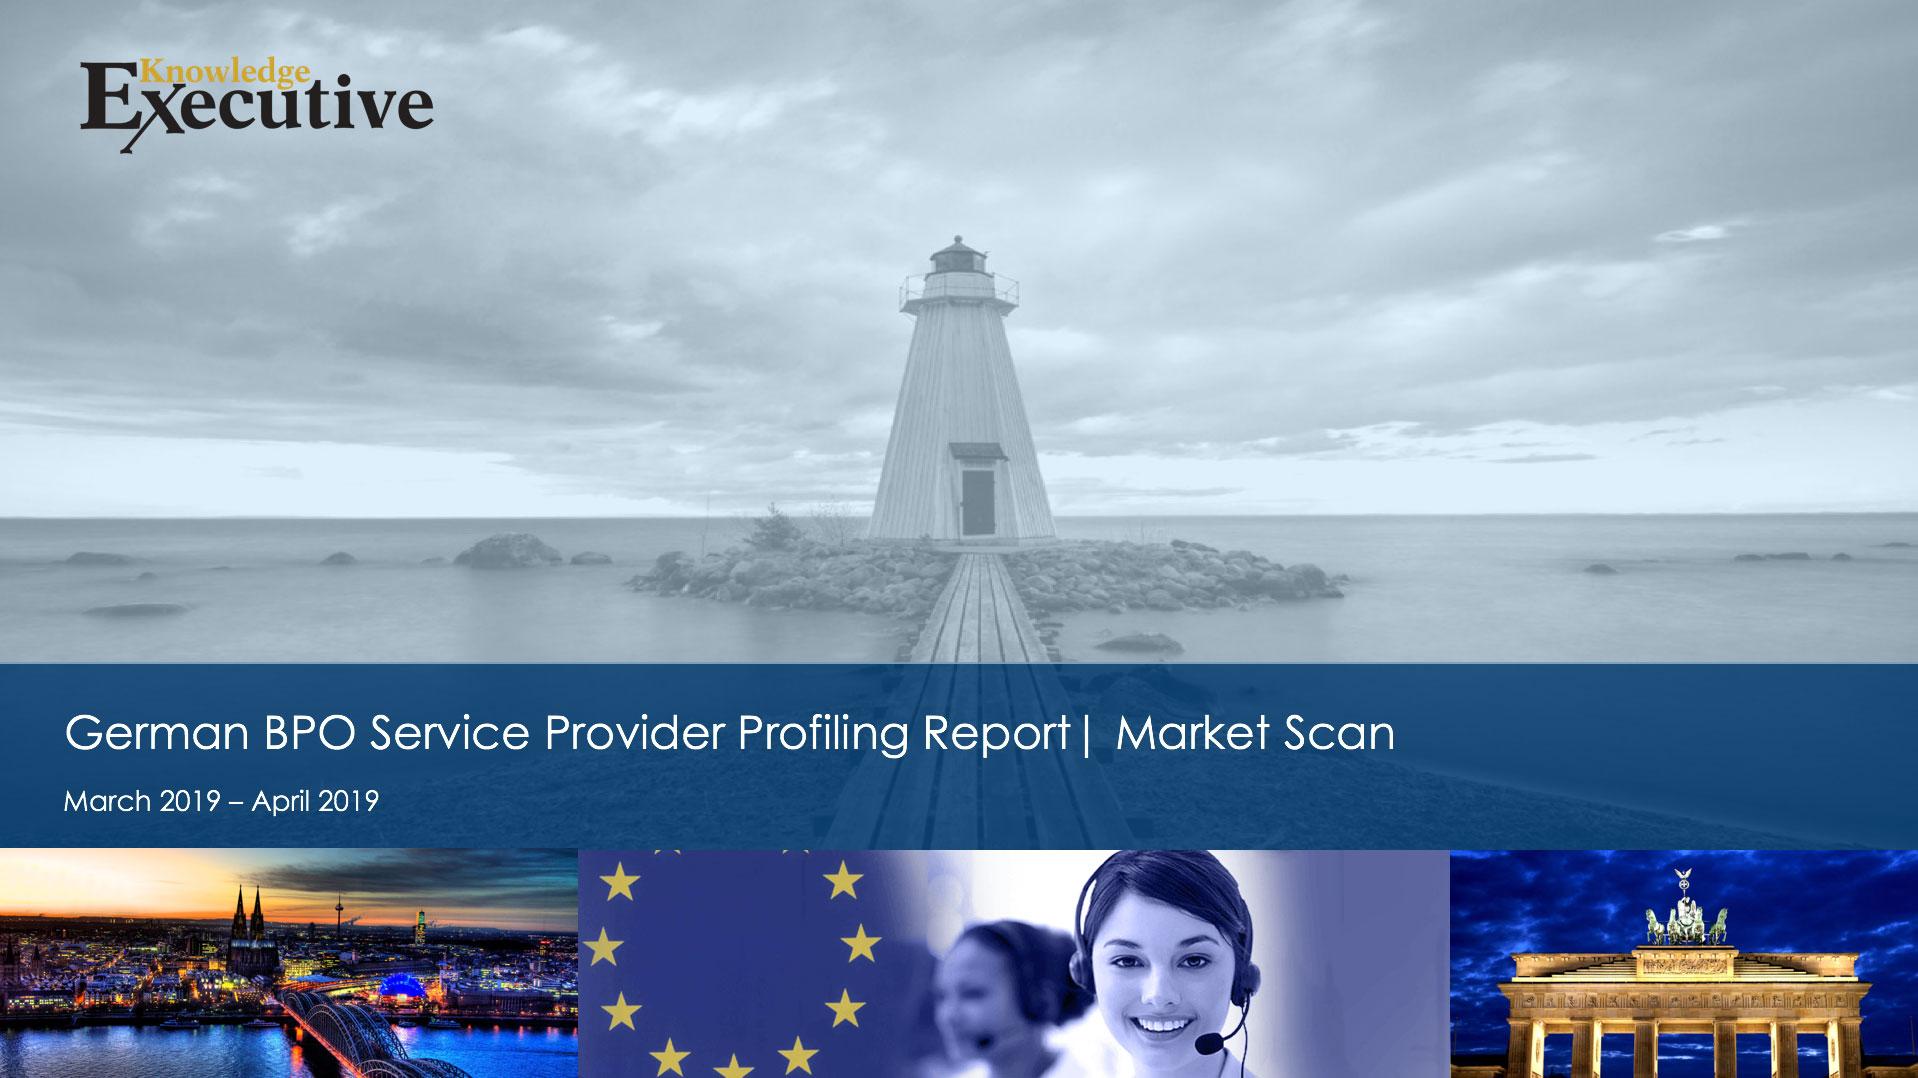 German-BPO-Service-Provider-Profiling-Report-Cover